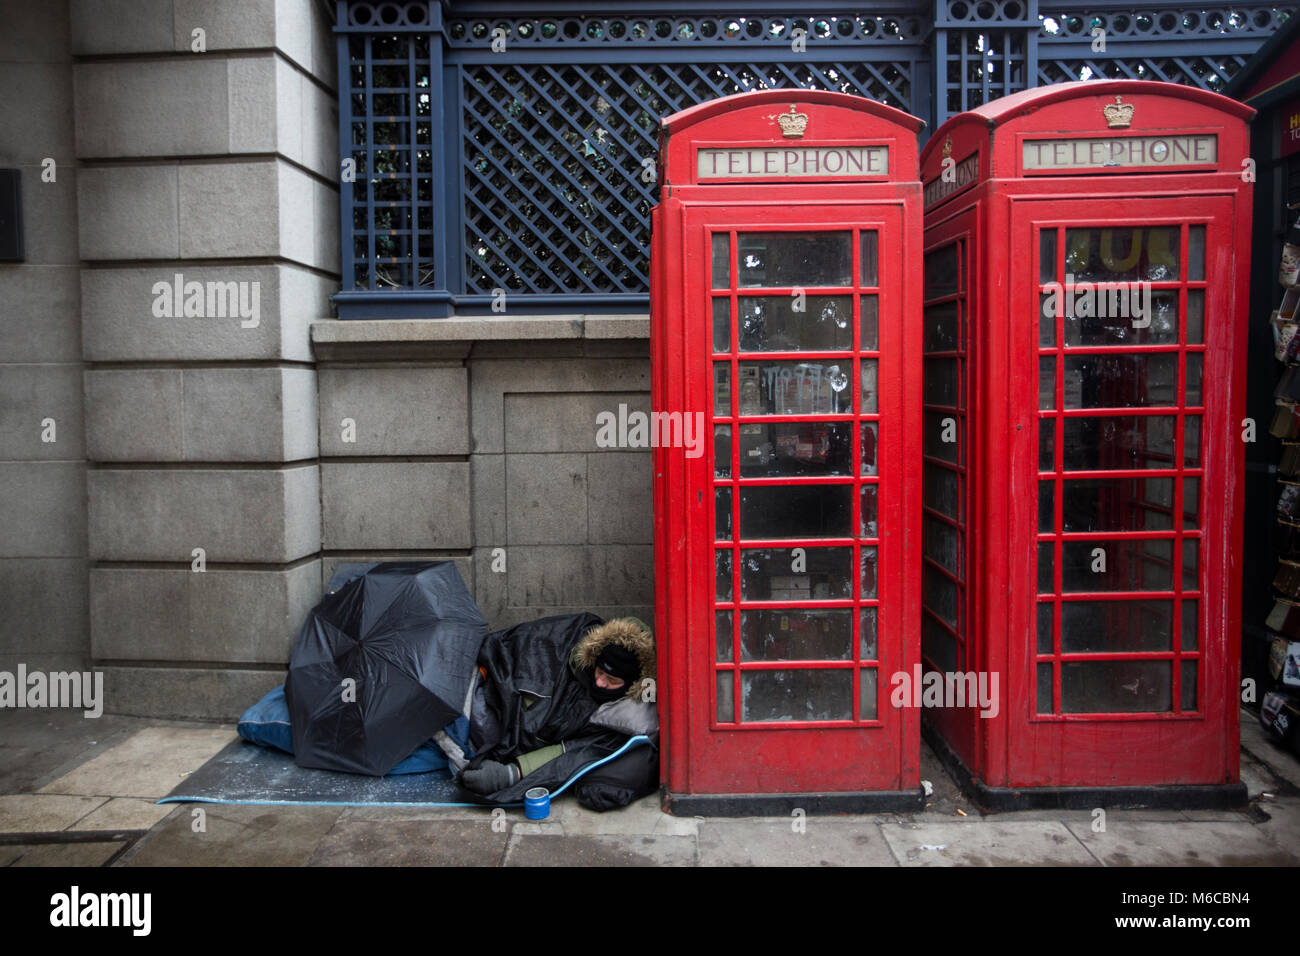 Cabina Telefonica Londra Nome : Londra addio cabina telefonica rossa arrivano le colonnine wi fi